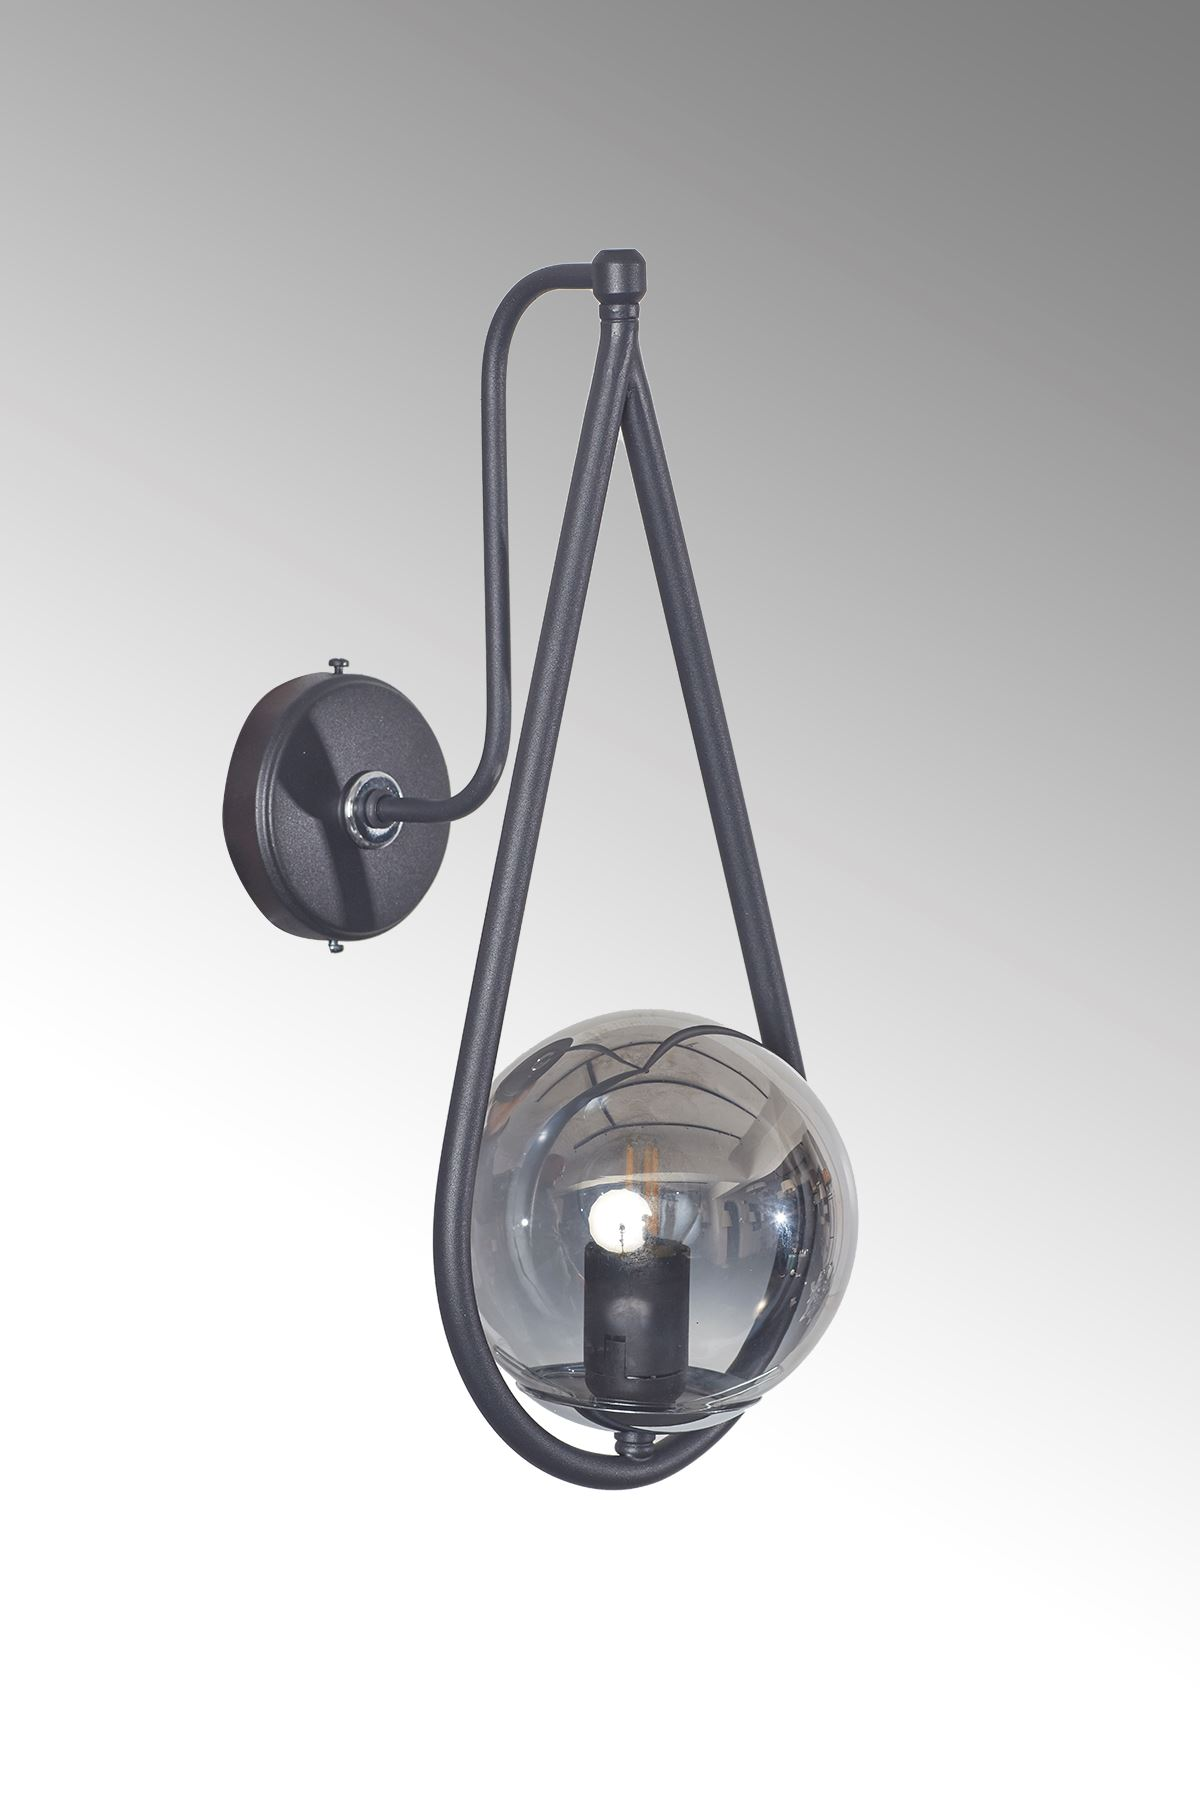 Siena Krom-Siyah Metal Gövde Füme Camlı Tasarım Lüx Aplik